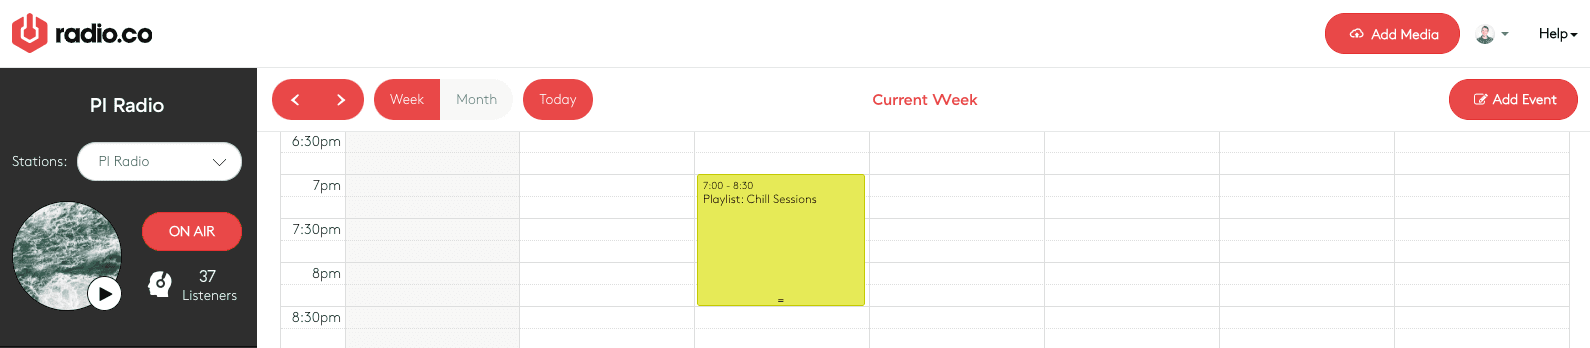 Event overrun - nothing scheduled afterwards